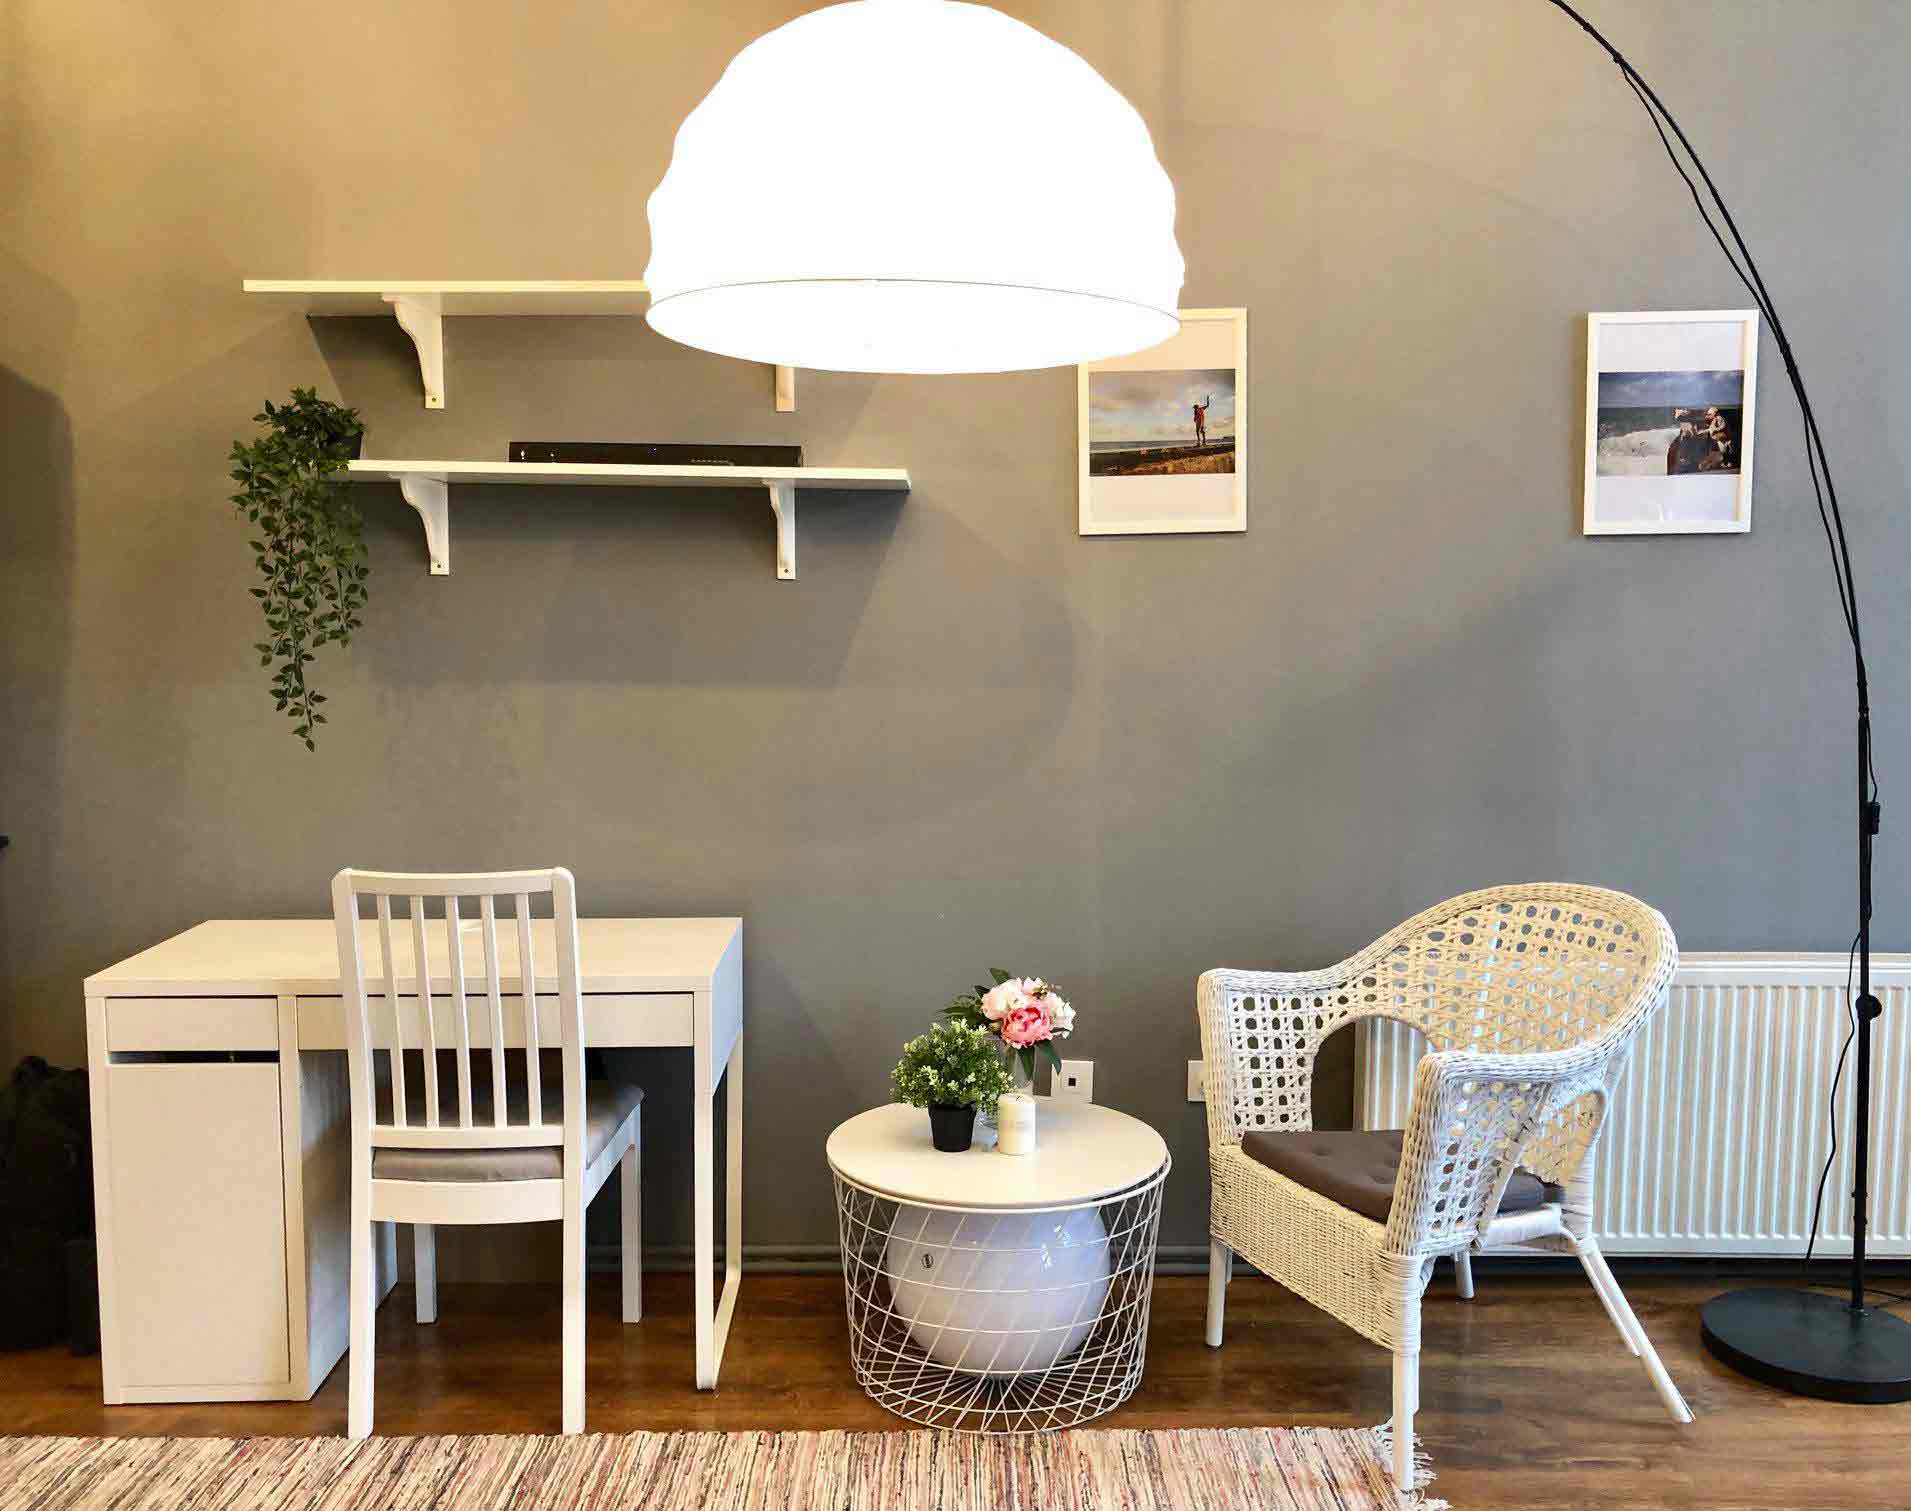 studio foto modern